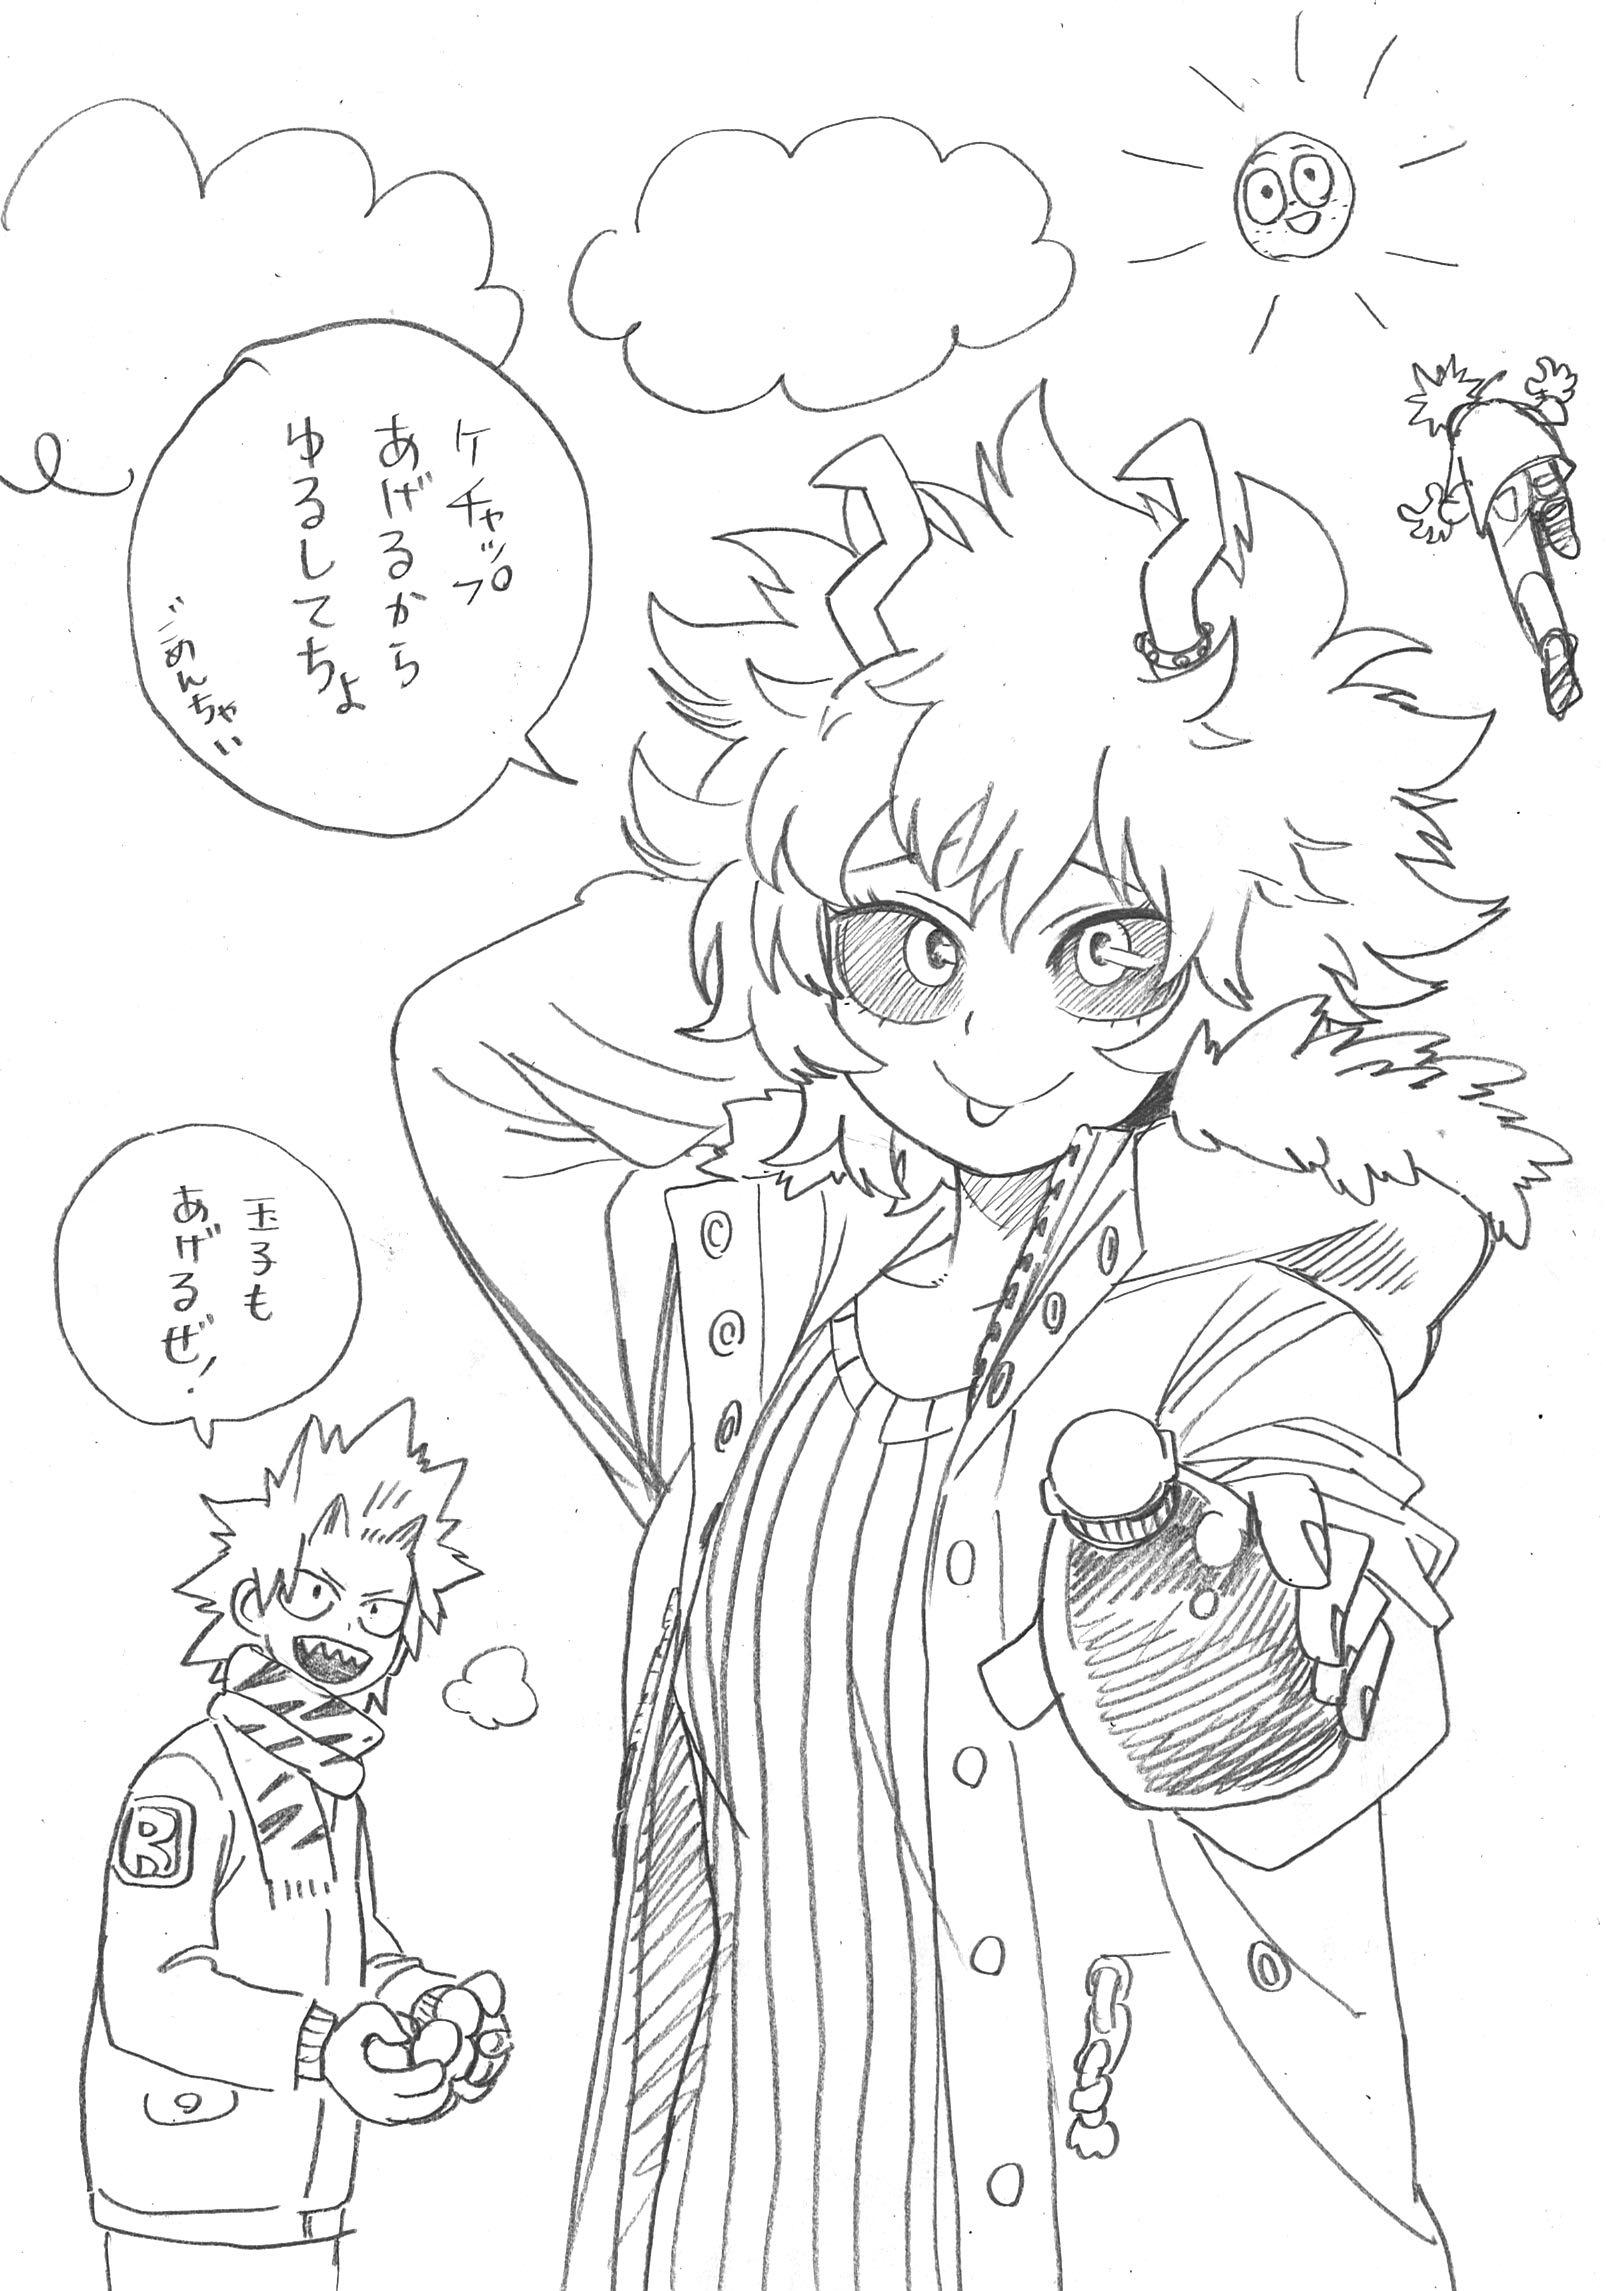 Eijiro and Mina Sketch